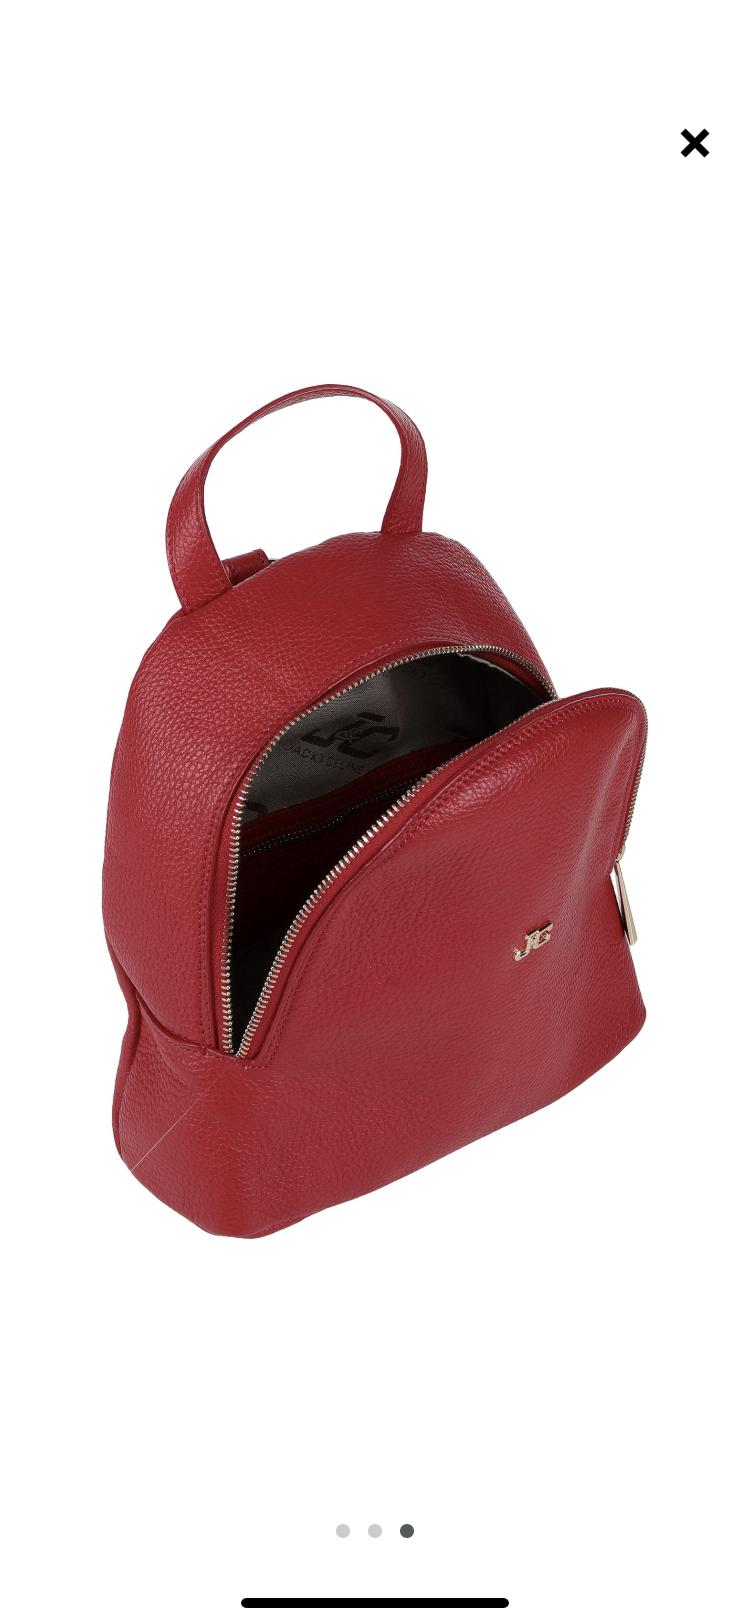 Кожаный рюкзак J&C JACKYCELINE 22 см х 23 см